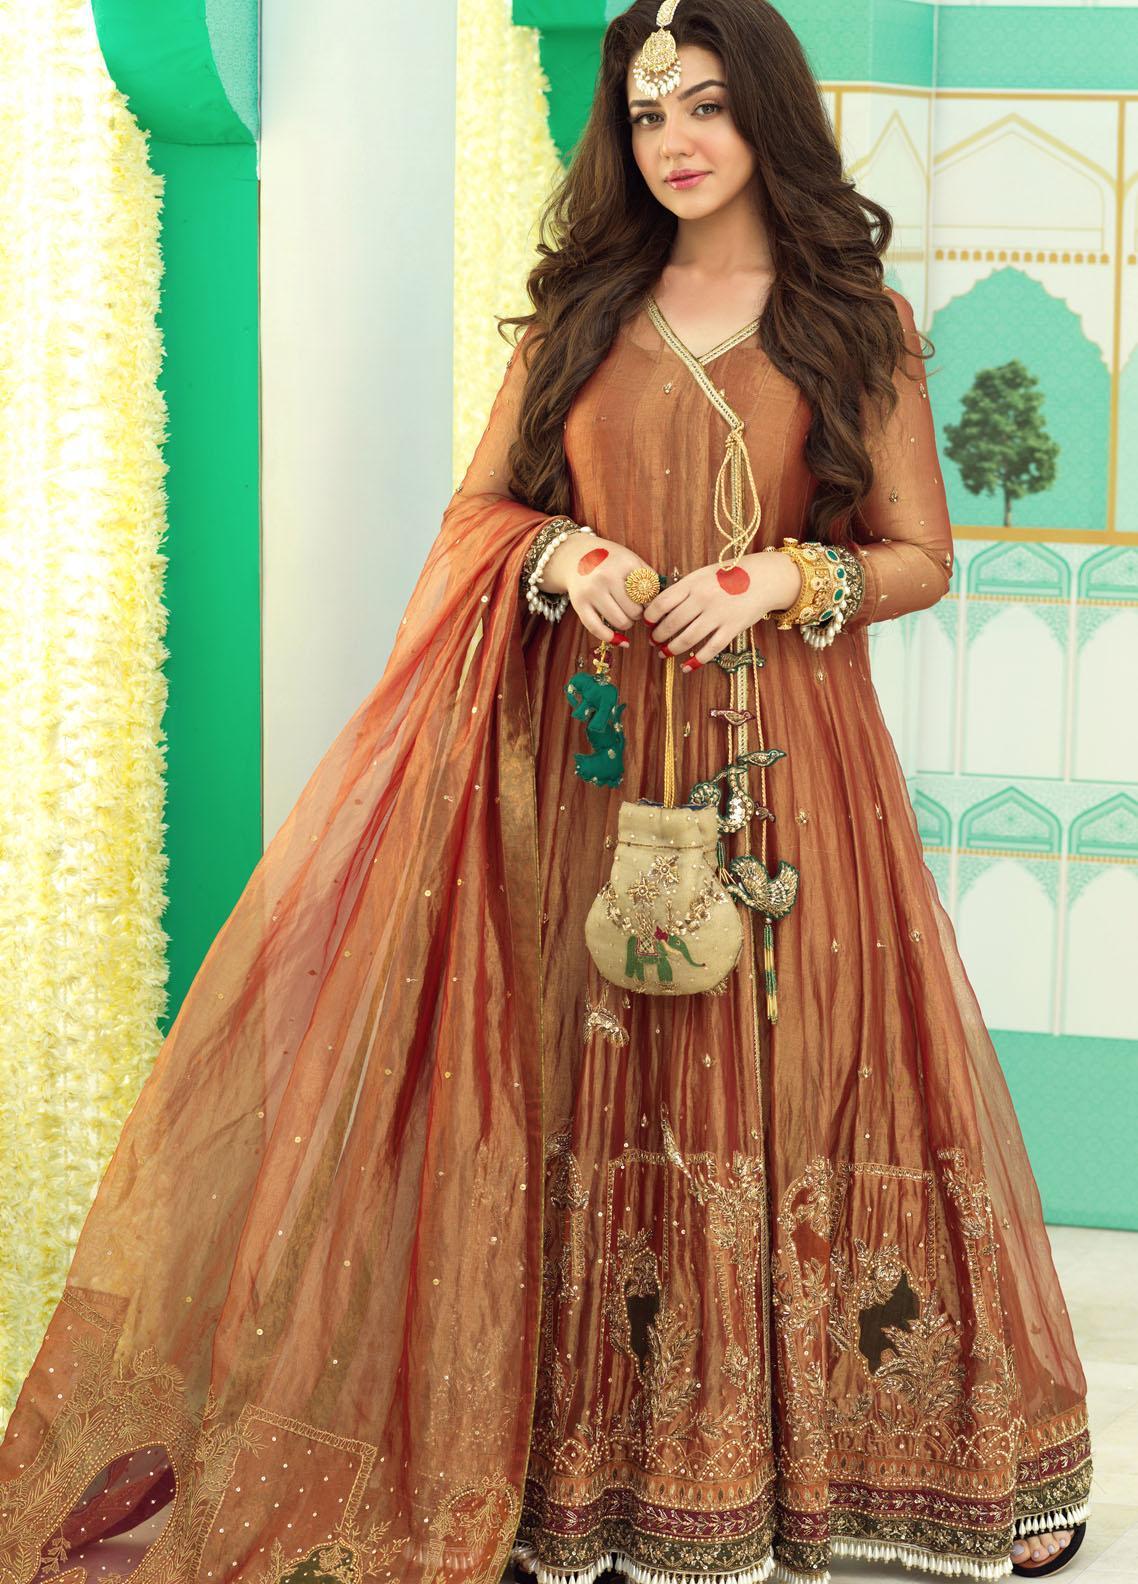 Zaaviay Luxury Pret Embroidered Missouri 3 Piece Dress MADHANIYA